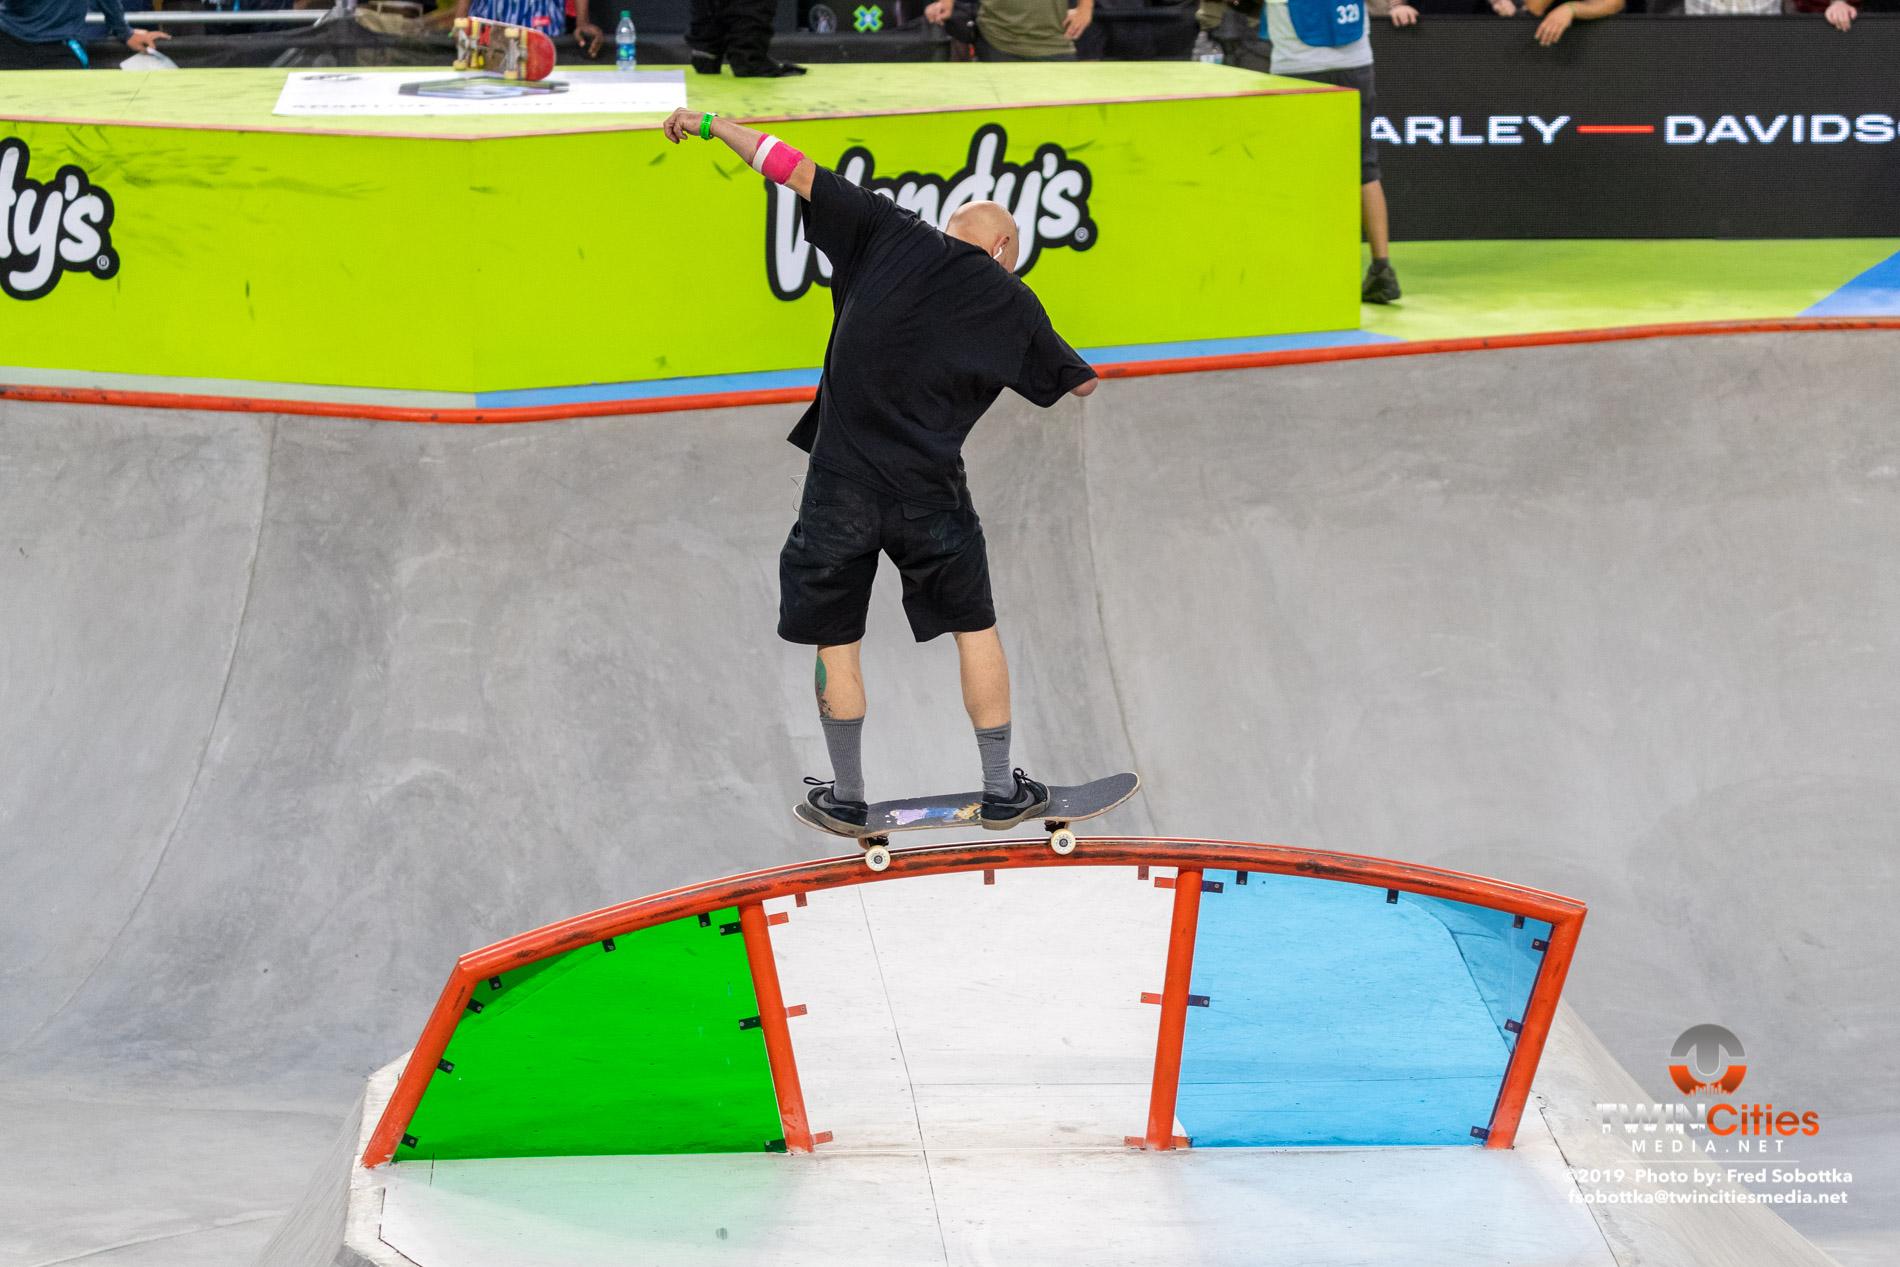 Adaptive-Skateboard-Park-05